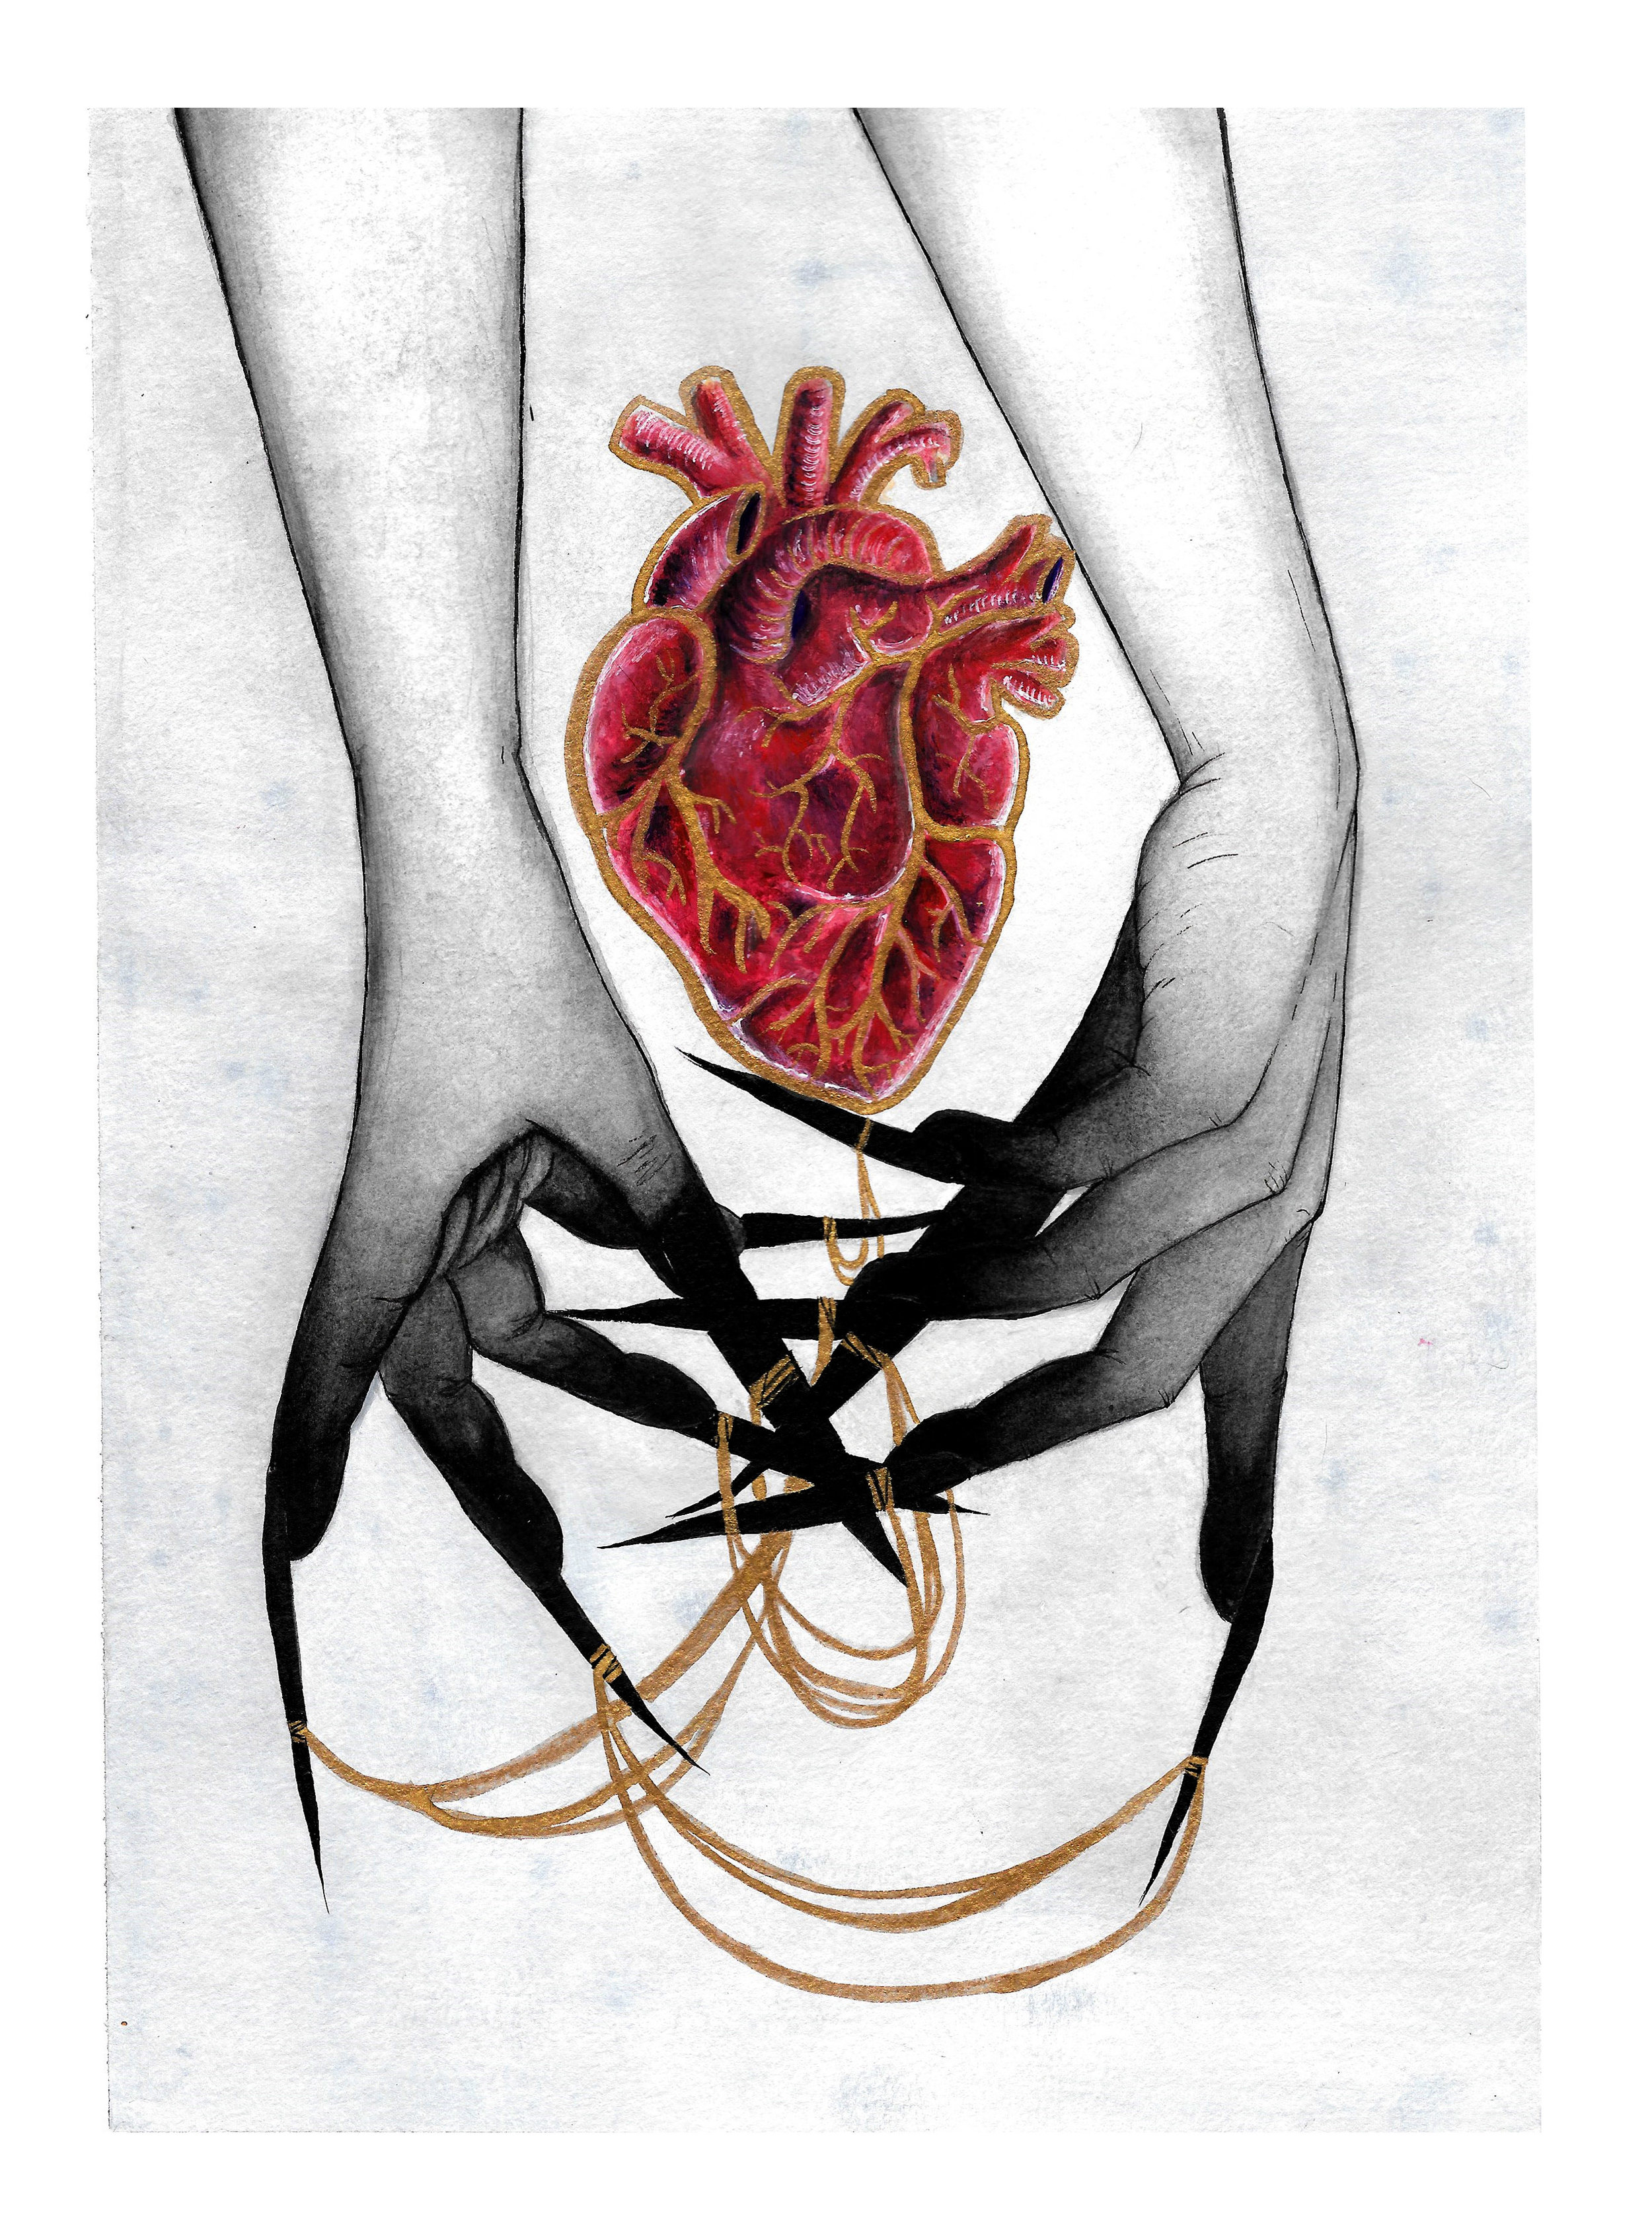 heart claws raw.jpg